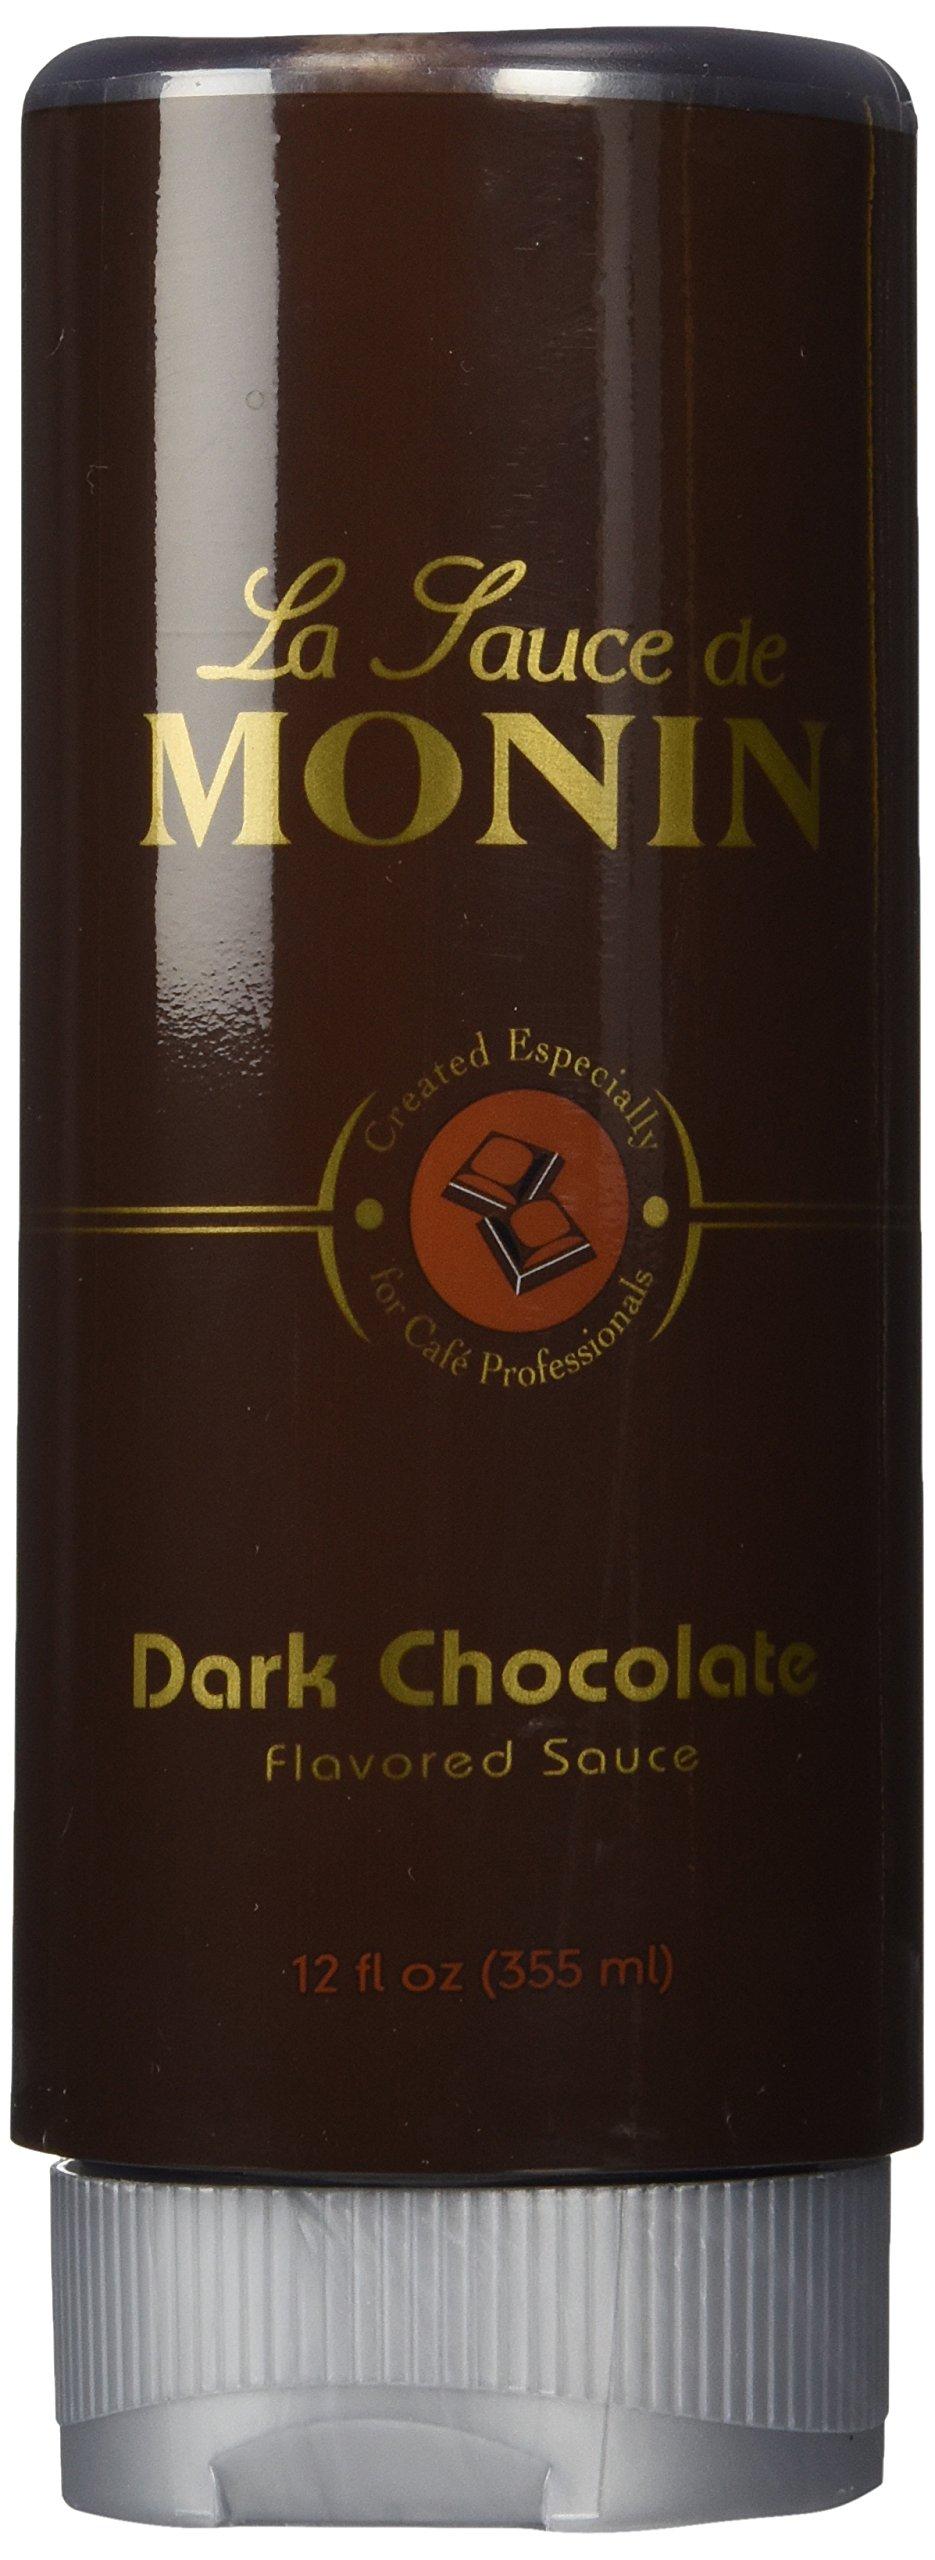 Monin Gourmet Dark Chocolate Sauce, 12 oz Squeeze Bottle